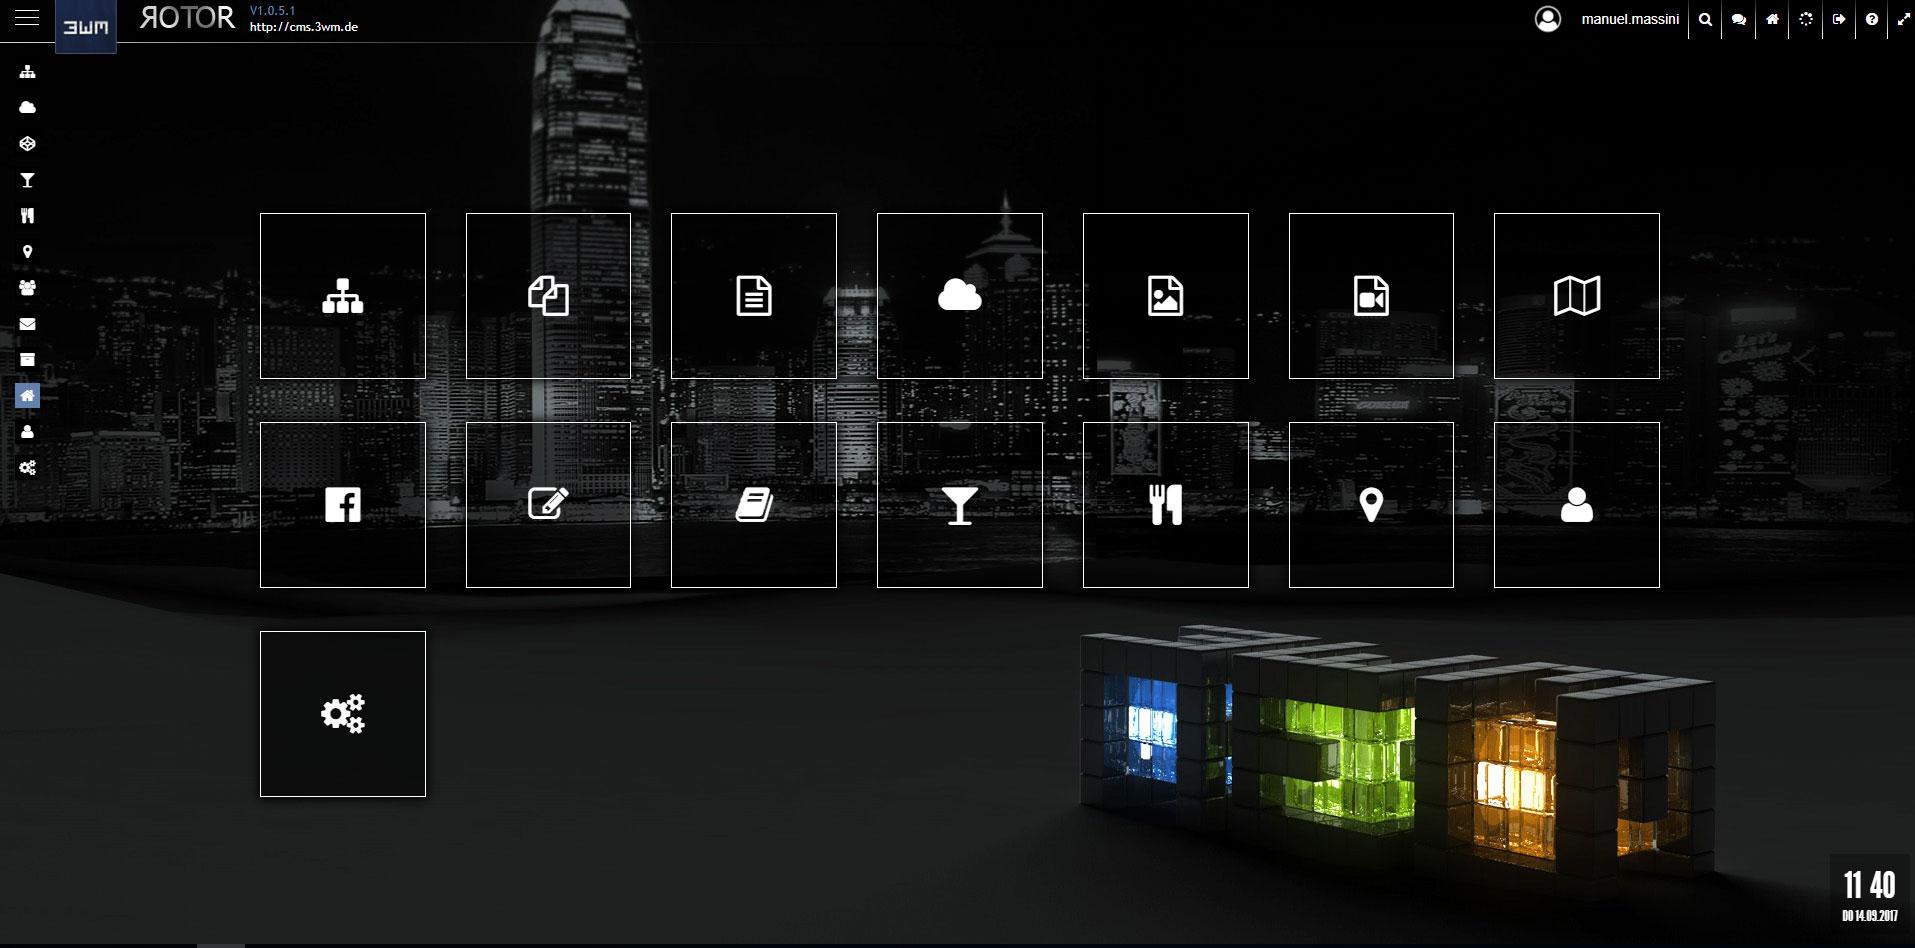 Abb. 1: Startseite mit Navigations-Icons, Navigation im CMS